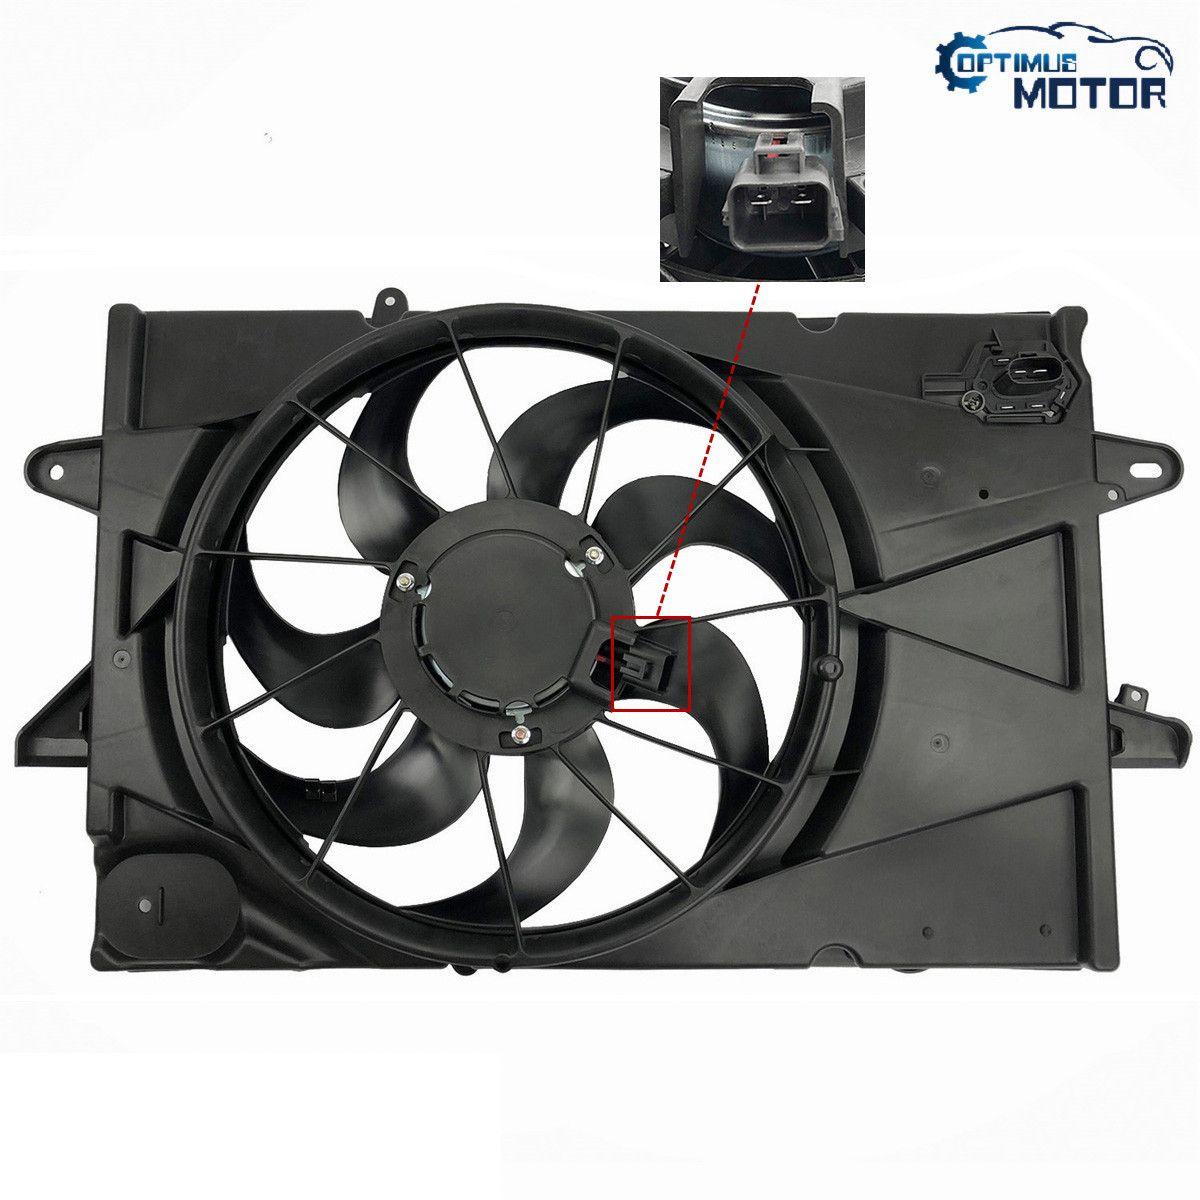 Radiator Condenser Fan for Chevrolet Malibu 13-15 Malibu Limited GM3115249 2.5L